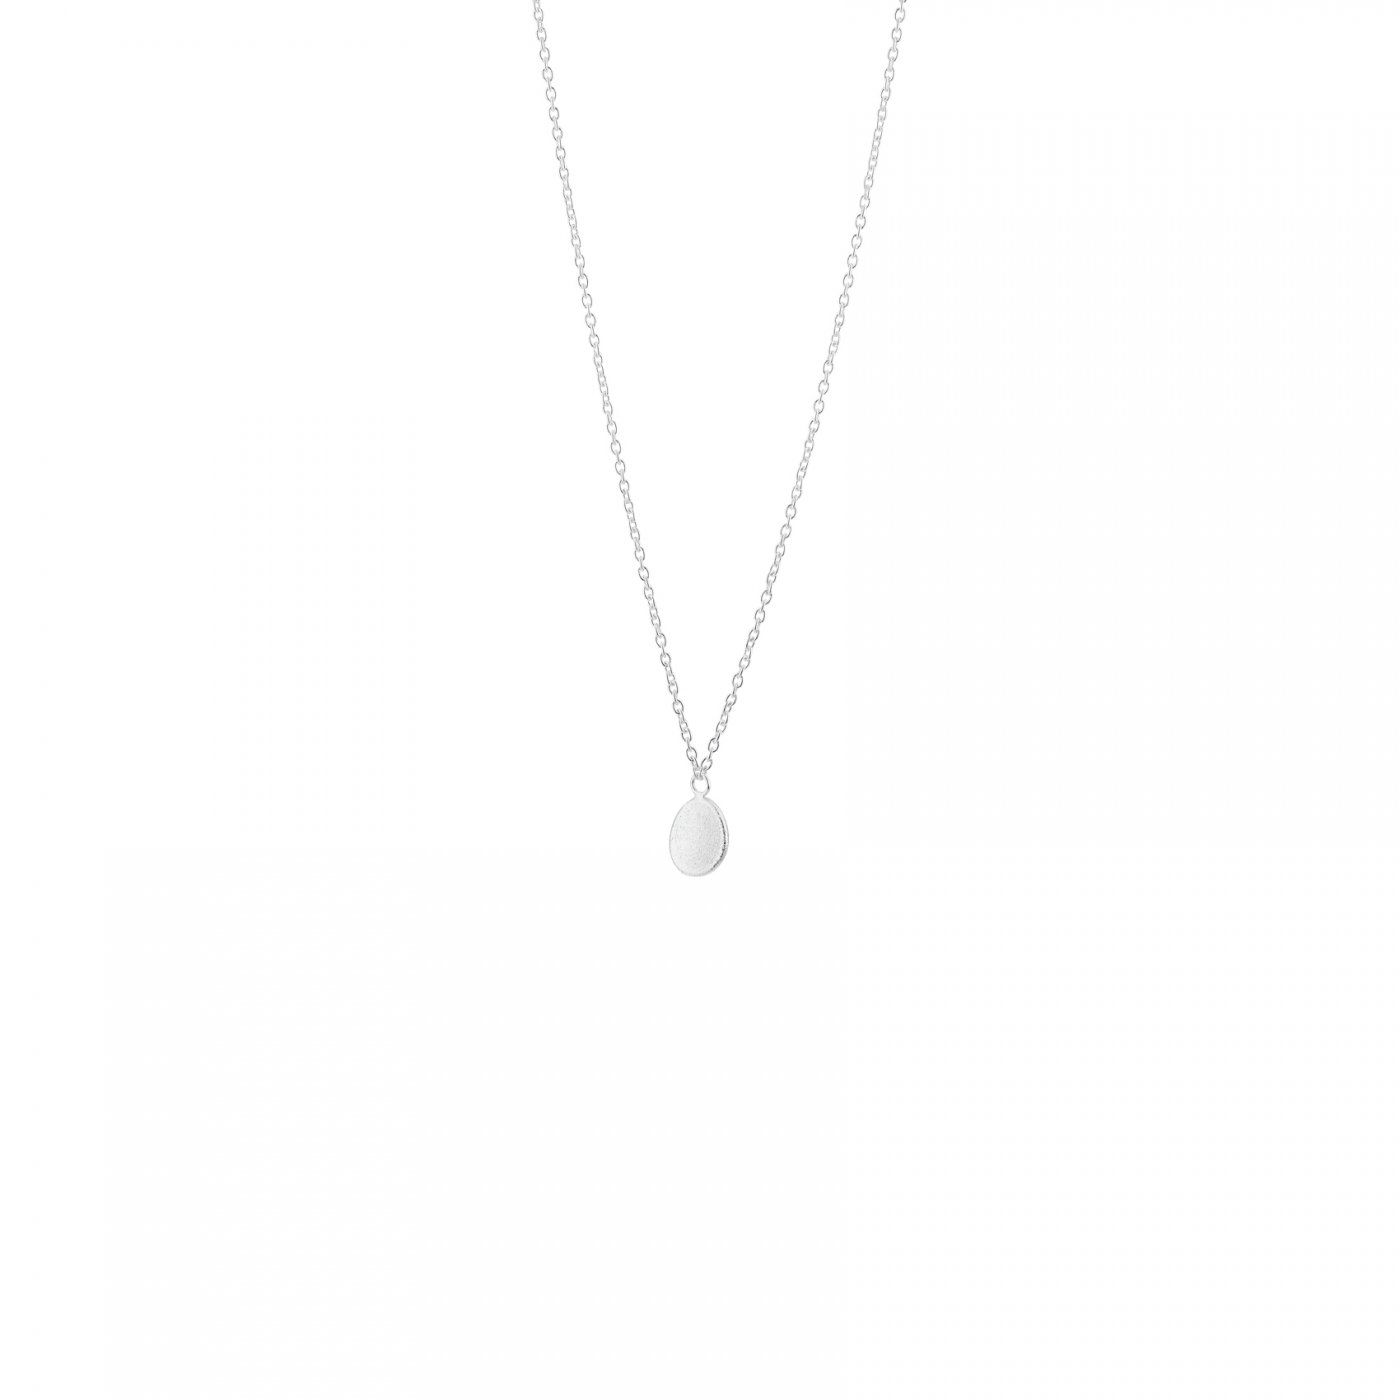 Rocky-Shore-single-necklace-zoom-1400x1400